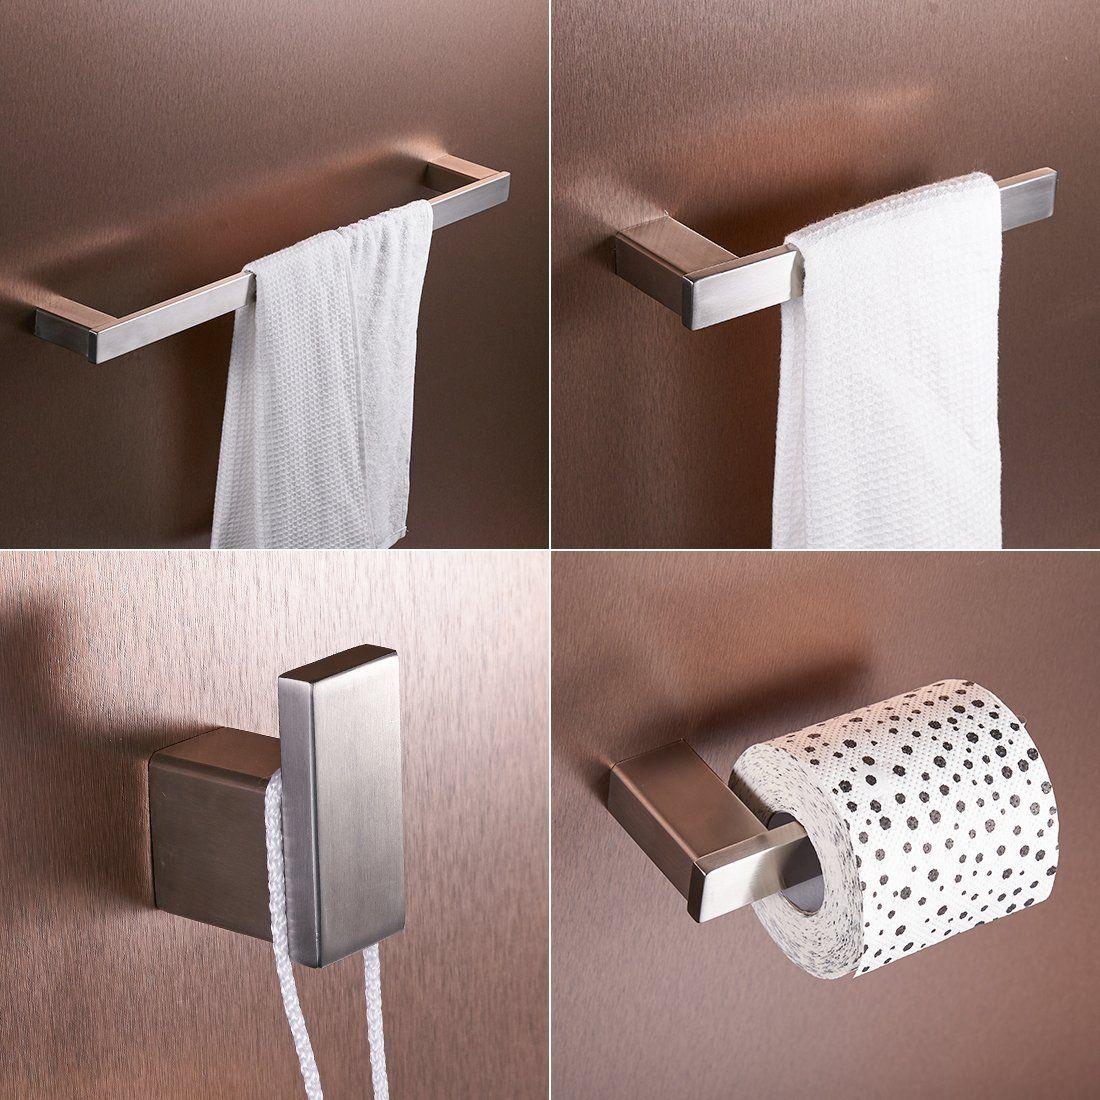 Amazon.com: FLG Wall Mount Stainless Steel 4-Piece Bathroom Hardware ...